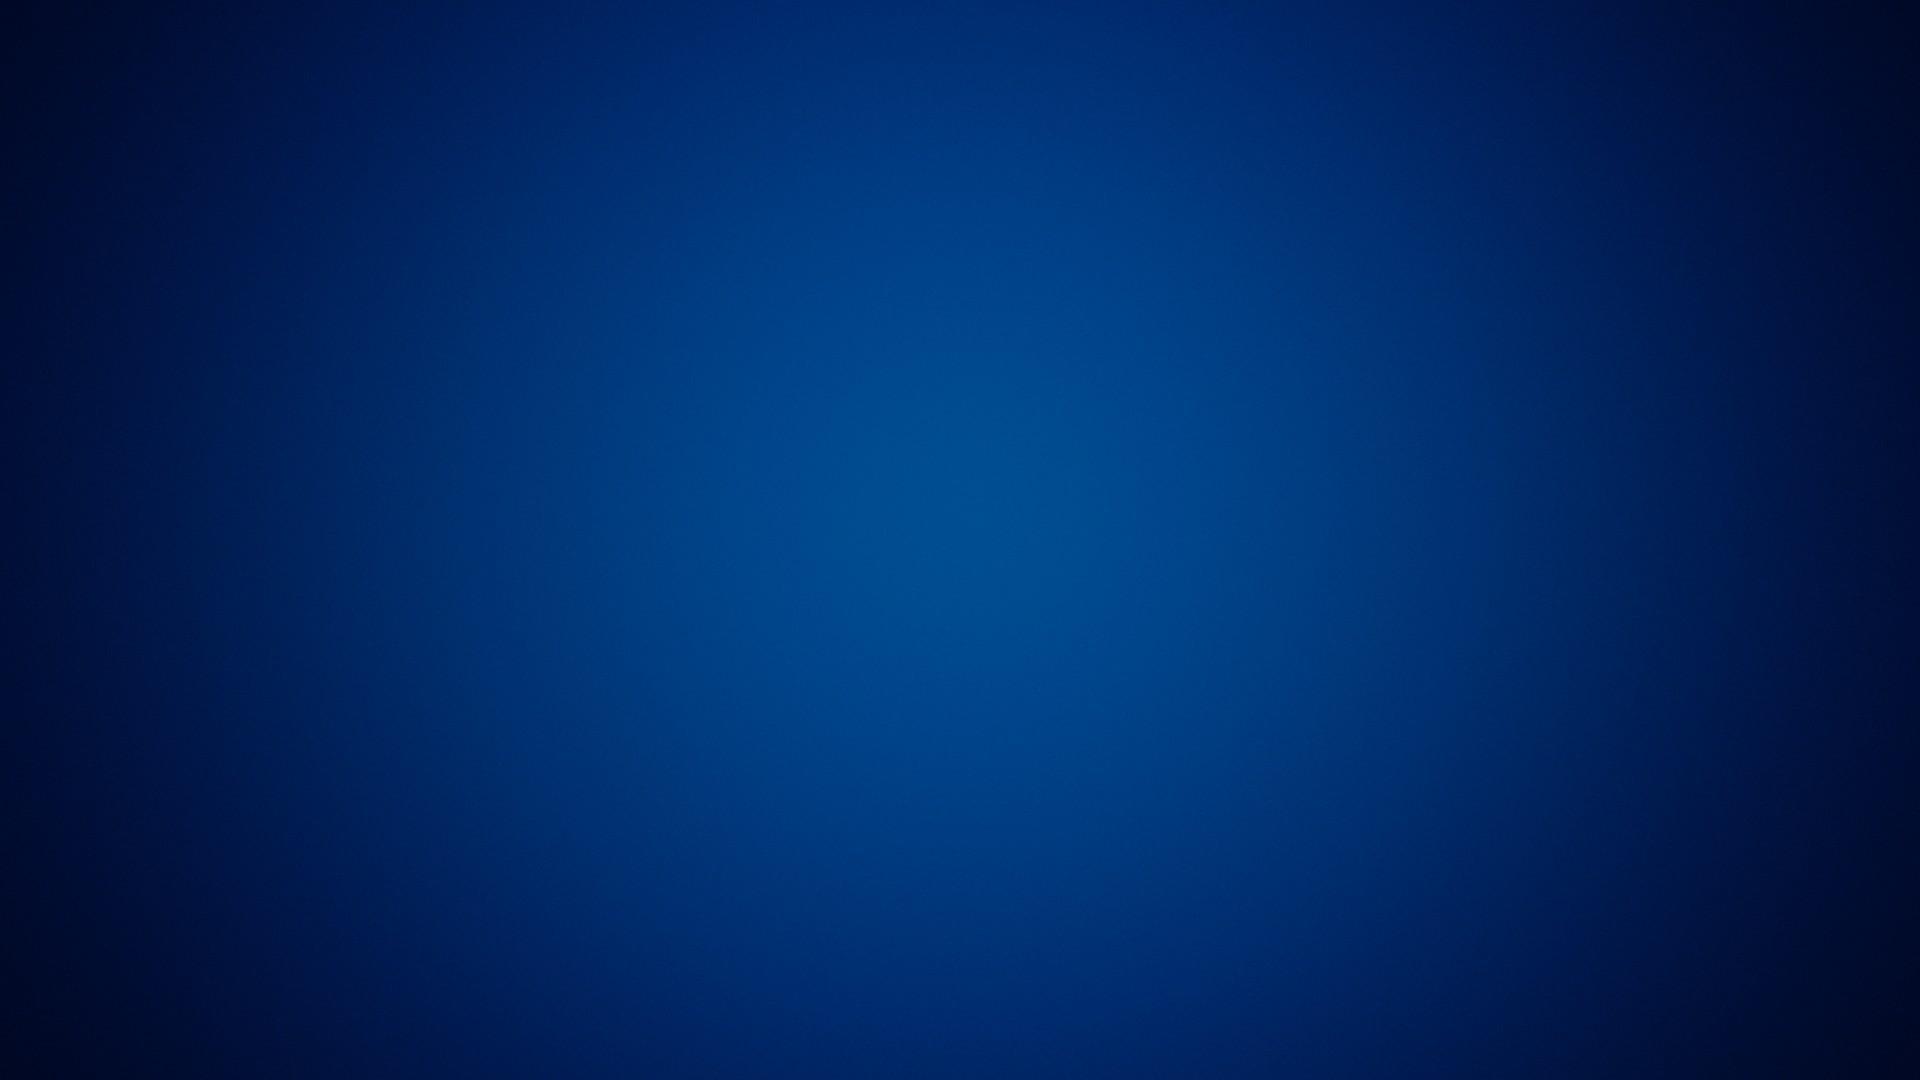 Blue Gradient Wallpaper 397